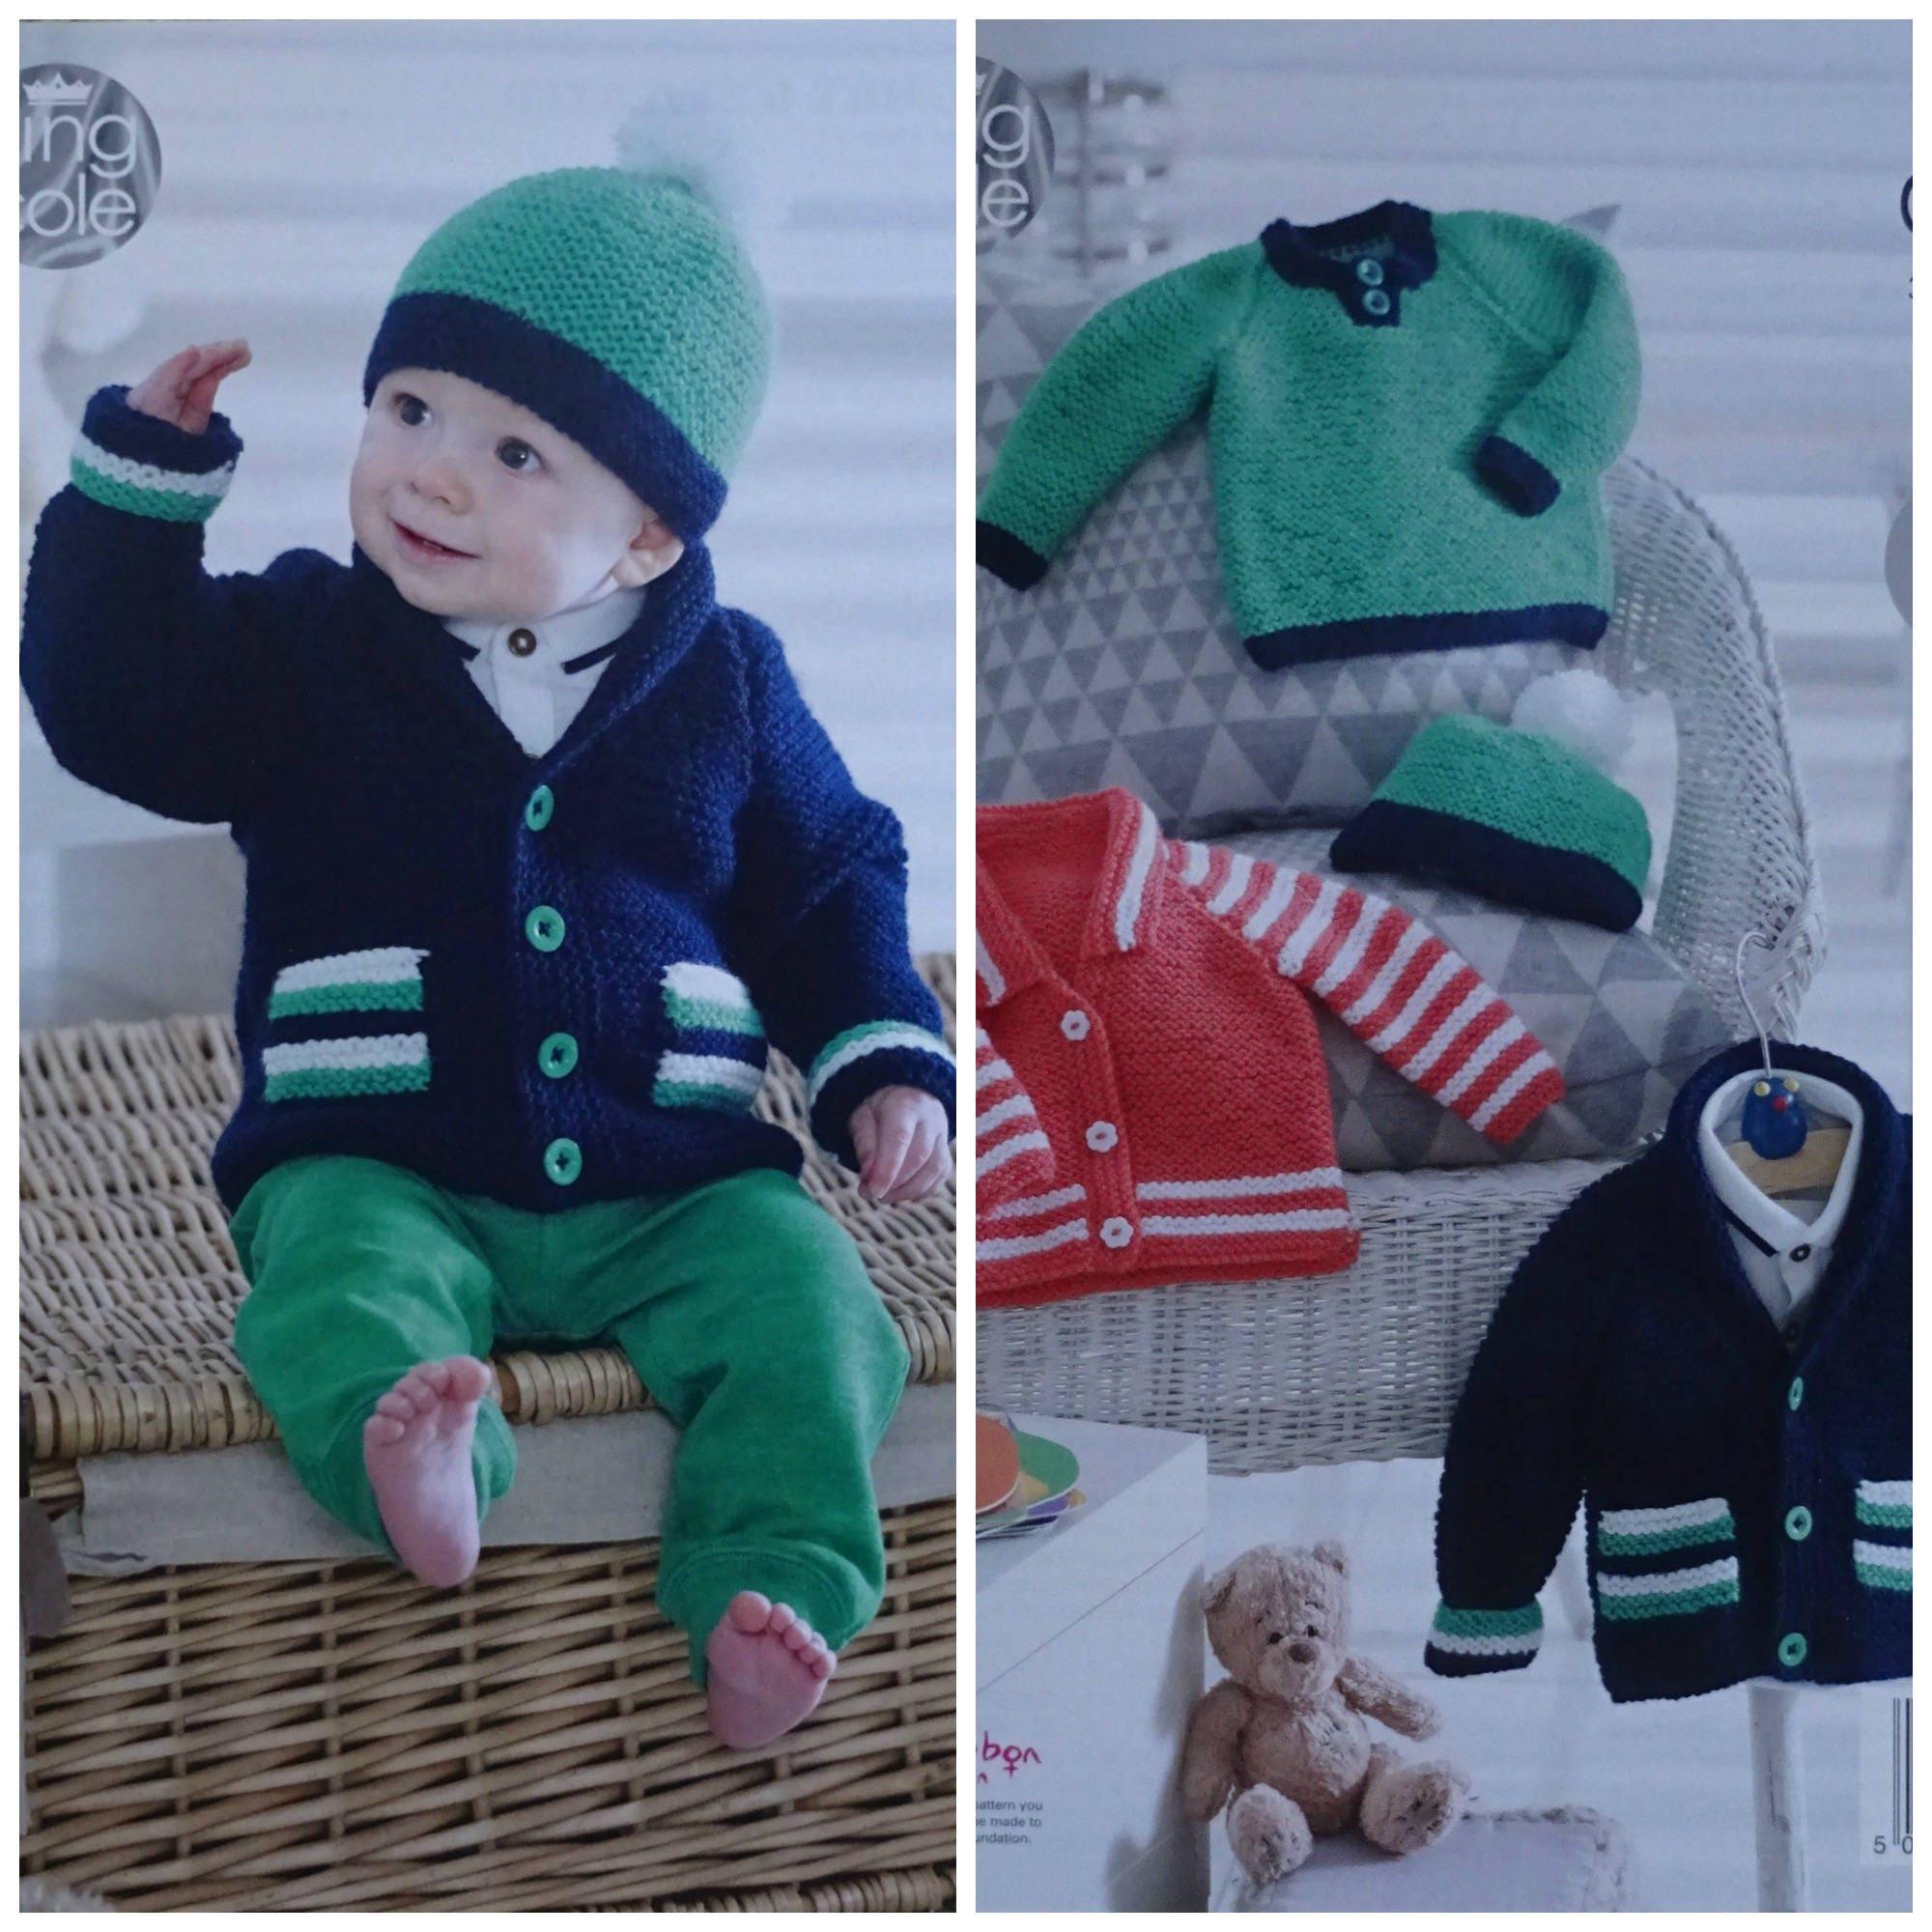 ba665577e79 Baby Knitting Pattern K4948 Babies Easy Knit Jackets